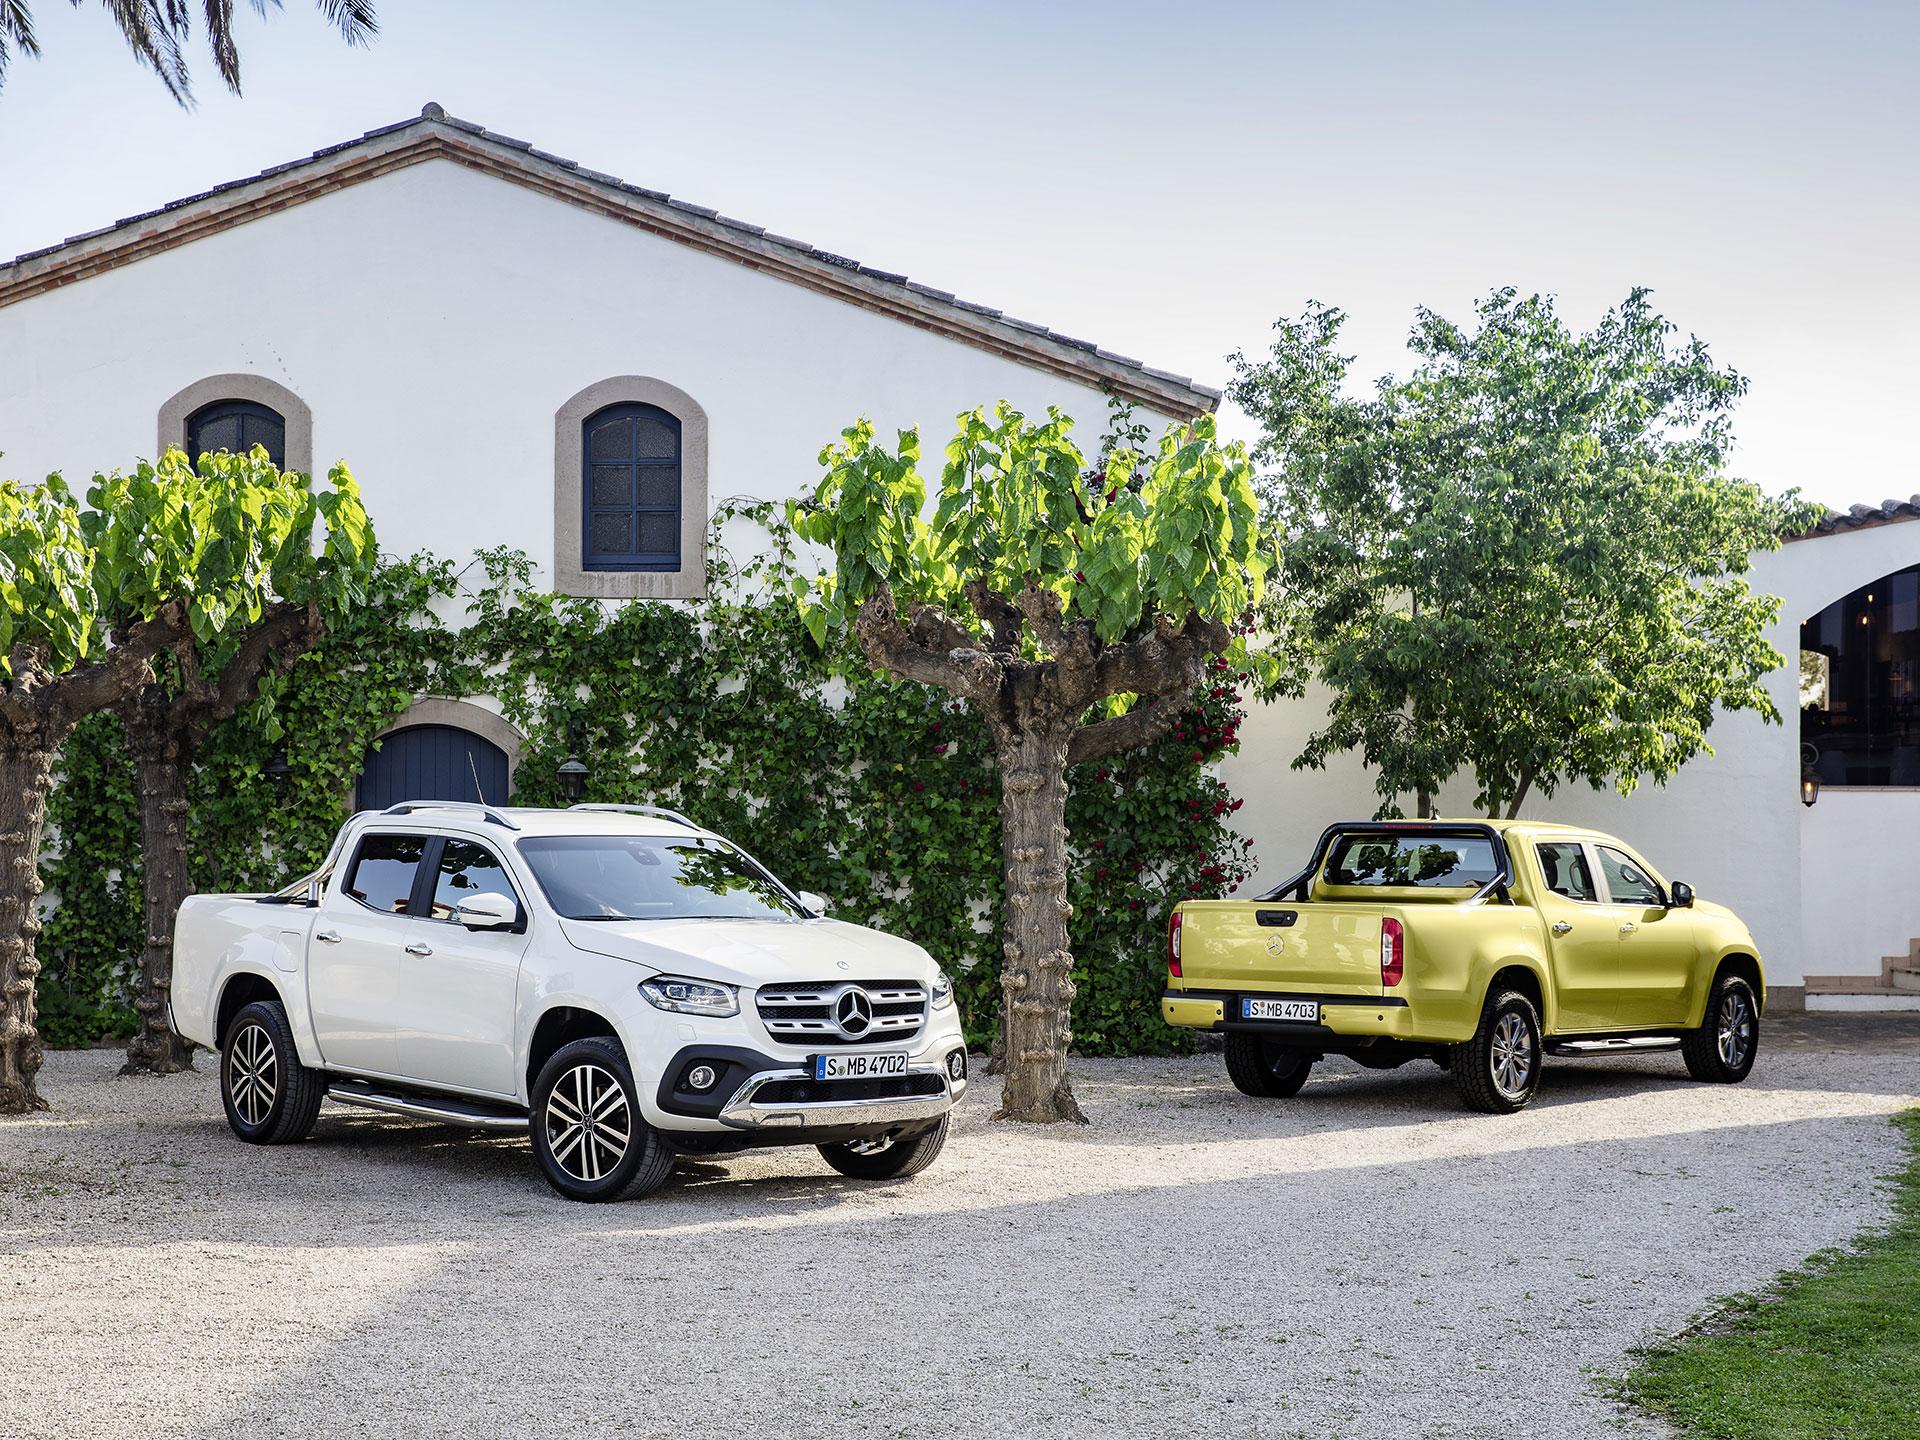 Fuera del cambio de parrilla, ésta pick up es idéntica a la camioneta japonesa, de la como toma su plataforma. Foto: Mercedes-Benz